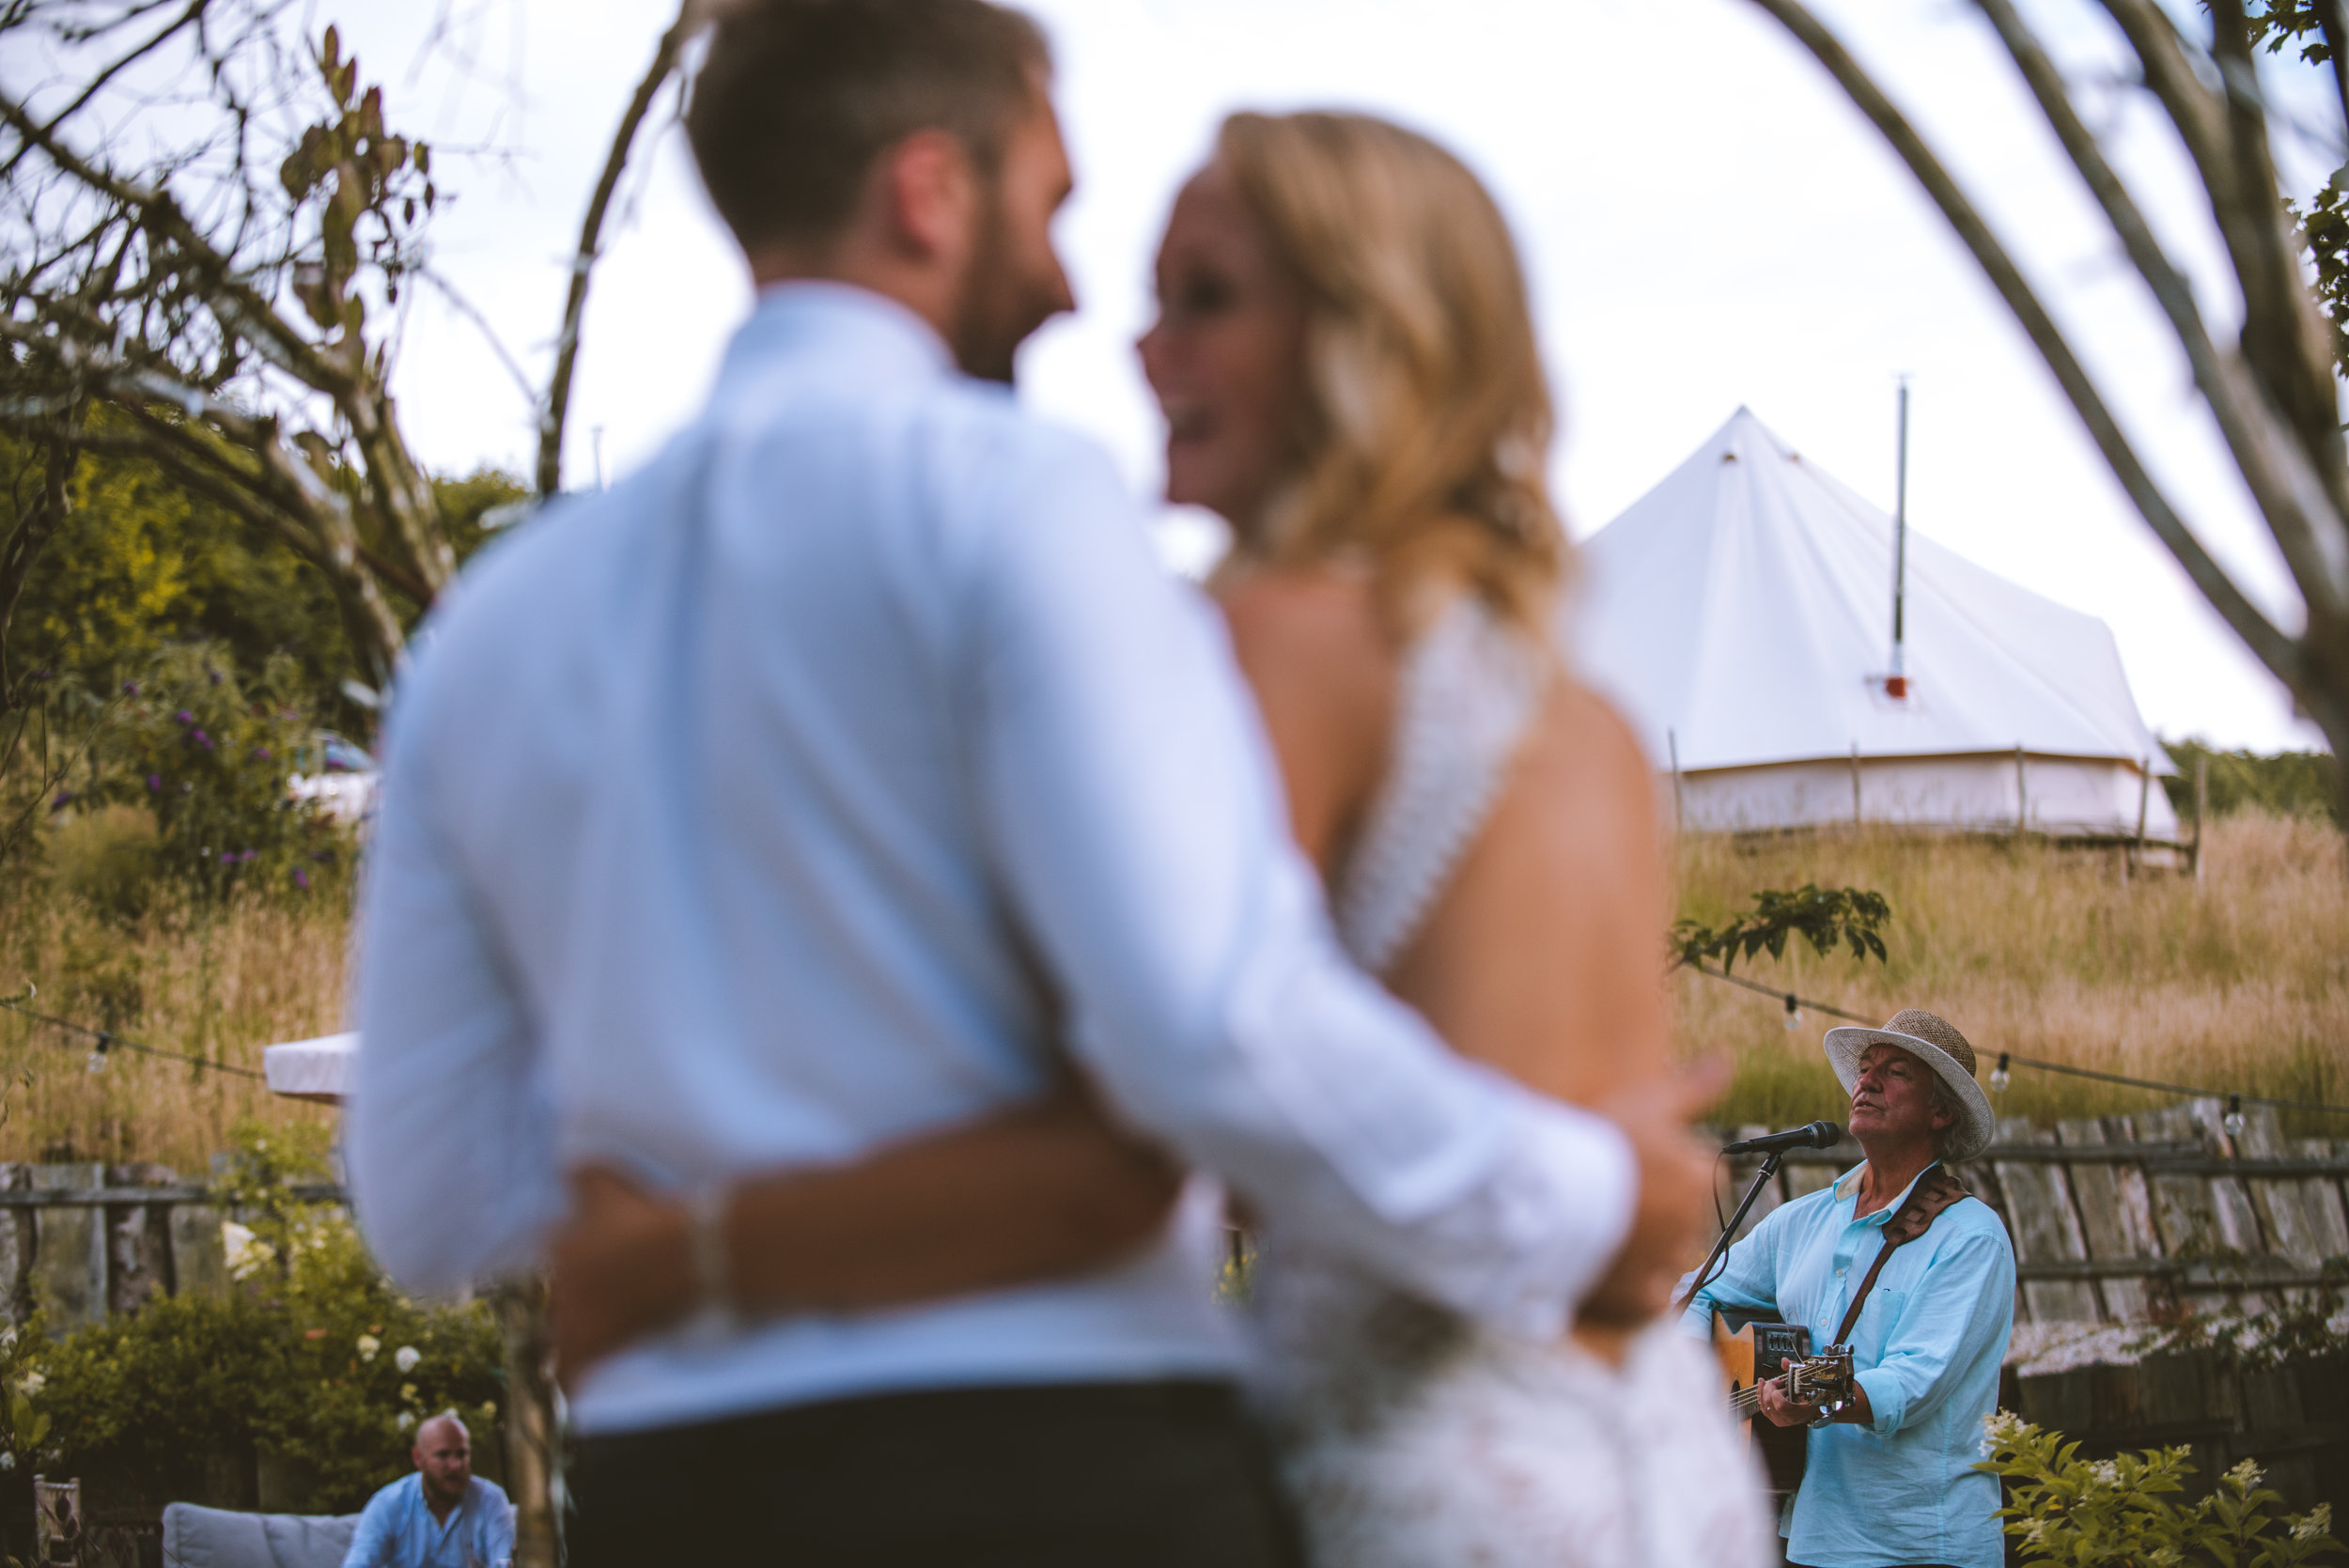 deers-leap-wedding-photographer-103.jpg